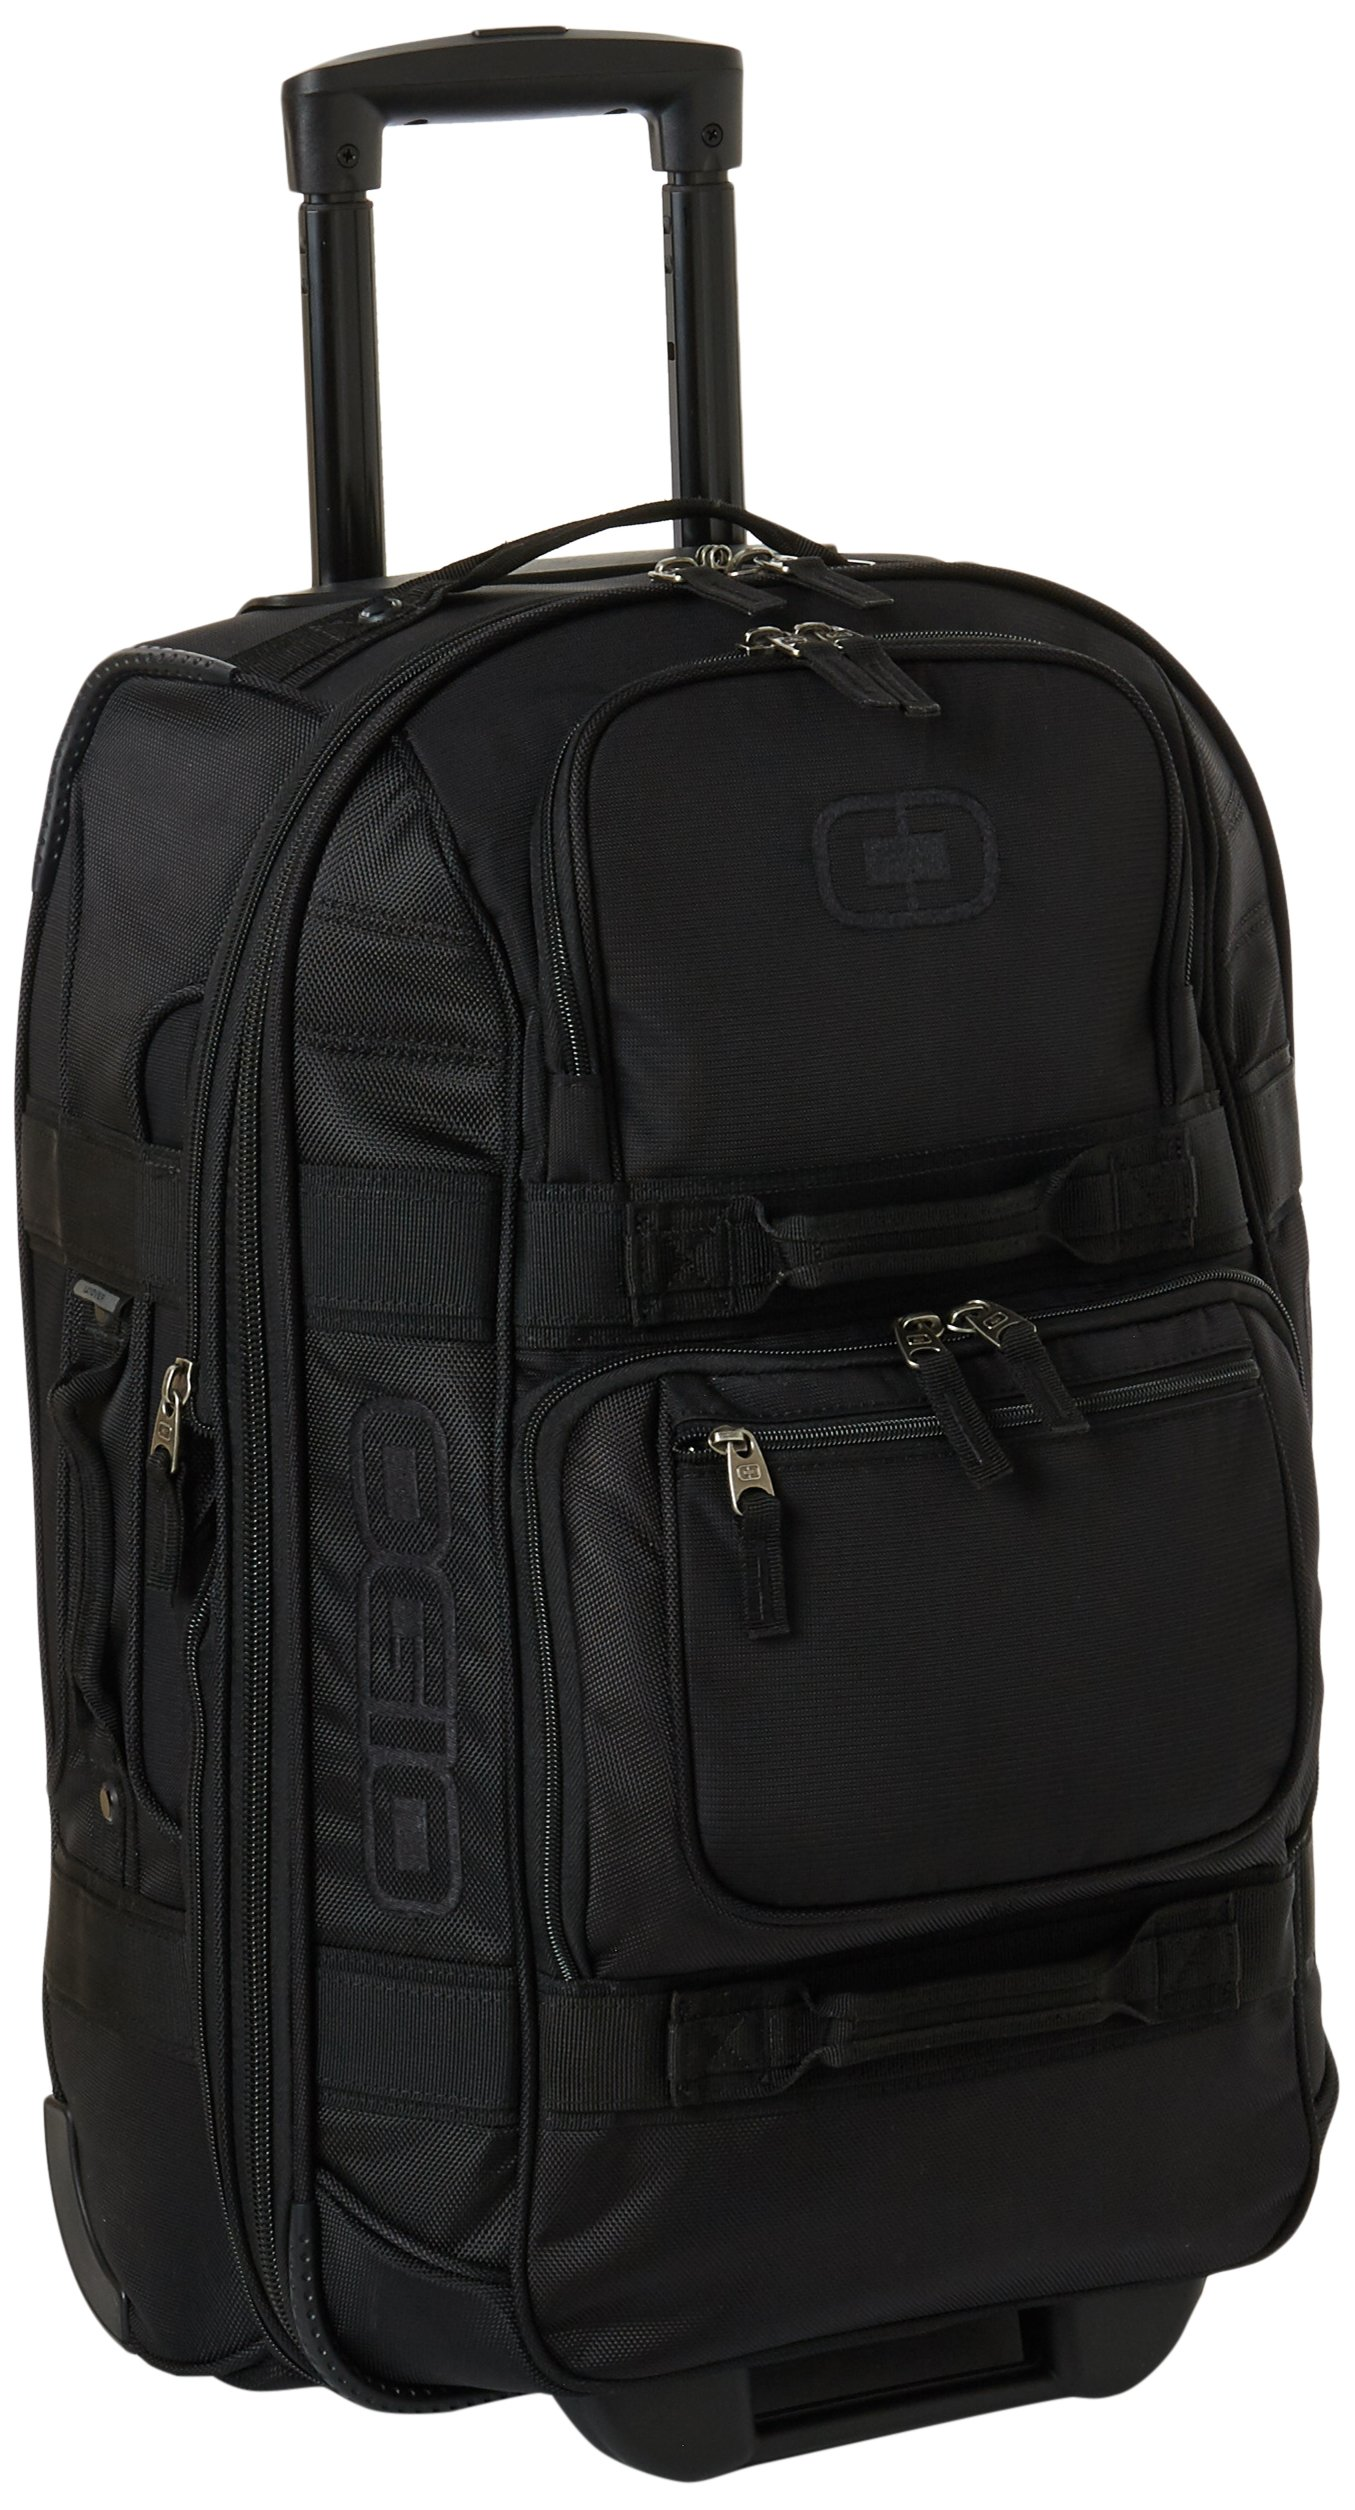 Ogio Layover Travel Bag (Stealth)